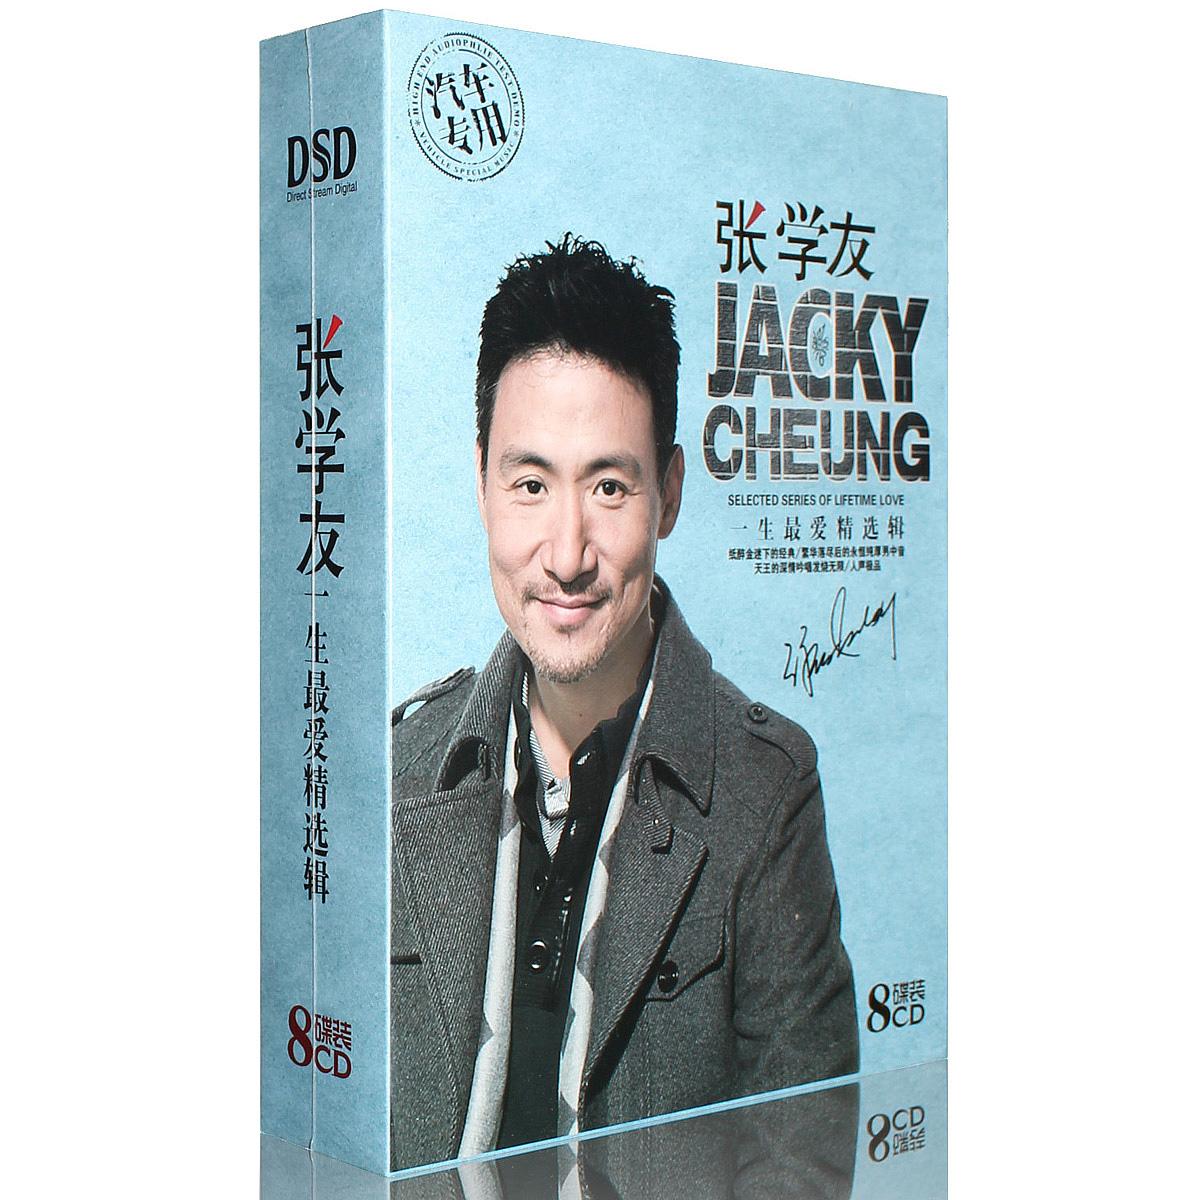 Музыка CD, DVD Cd Cd музыка cd dvd 2060868 carlos kleiber dvd